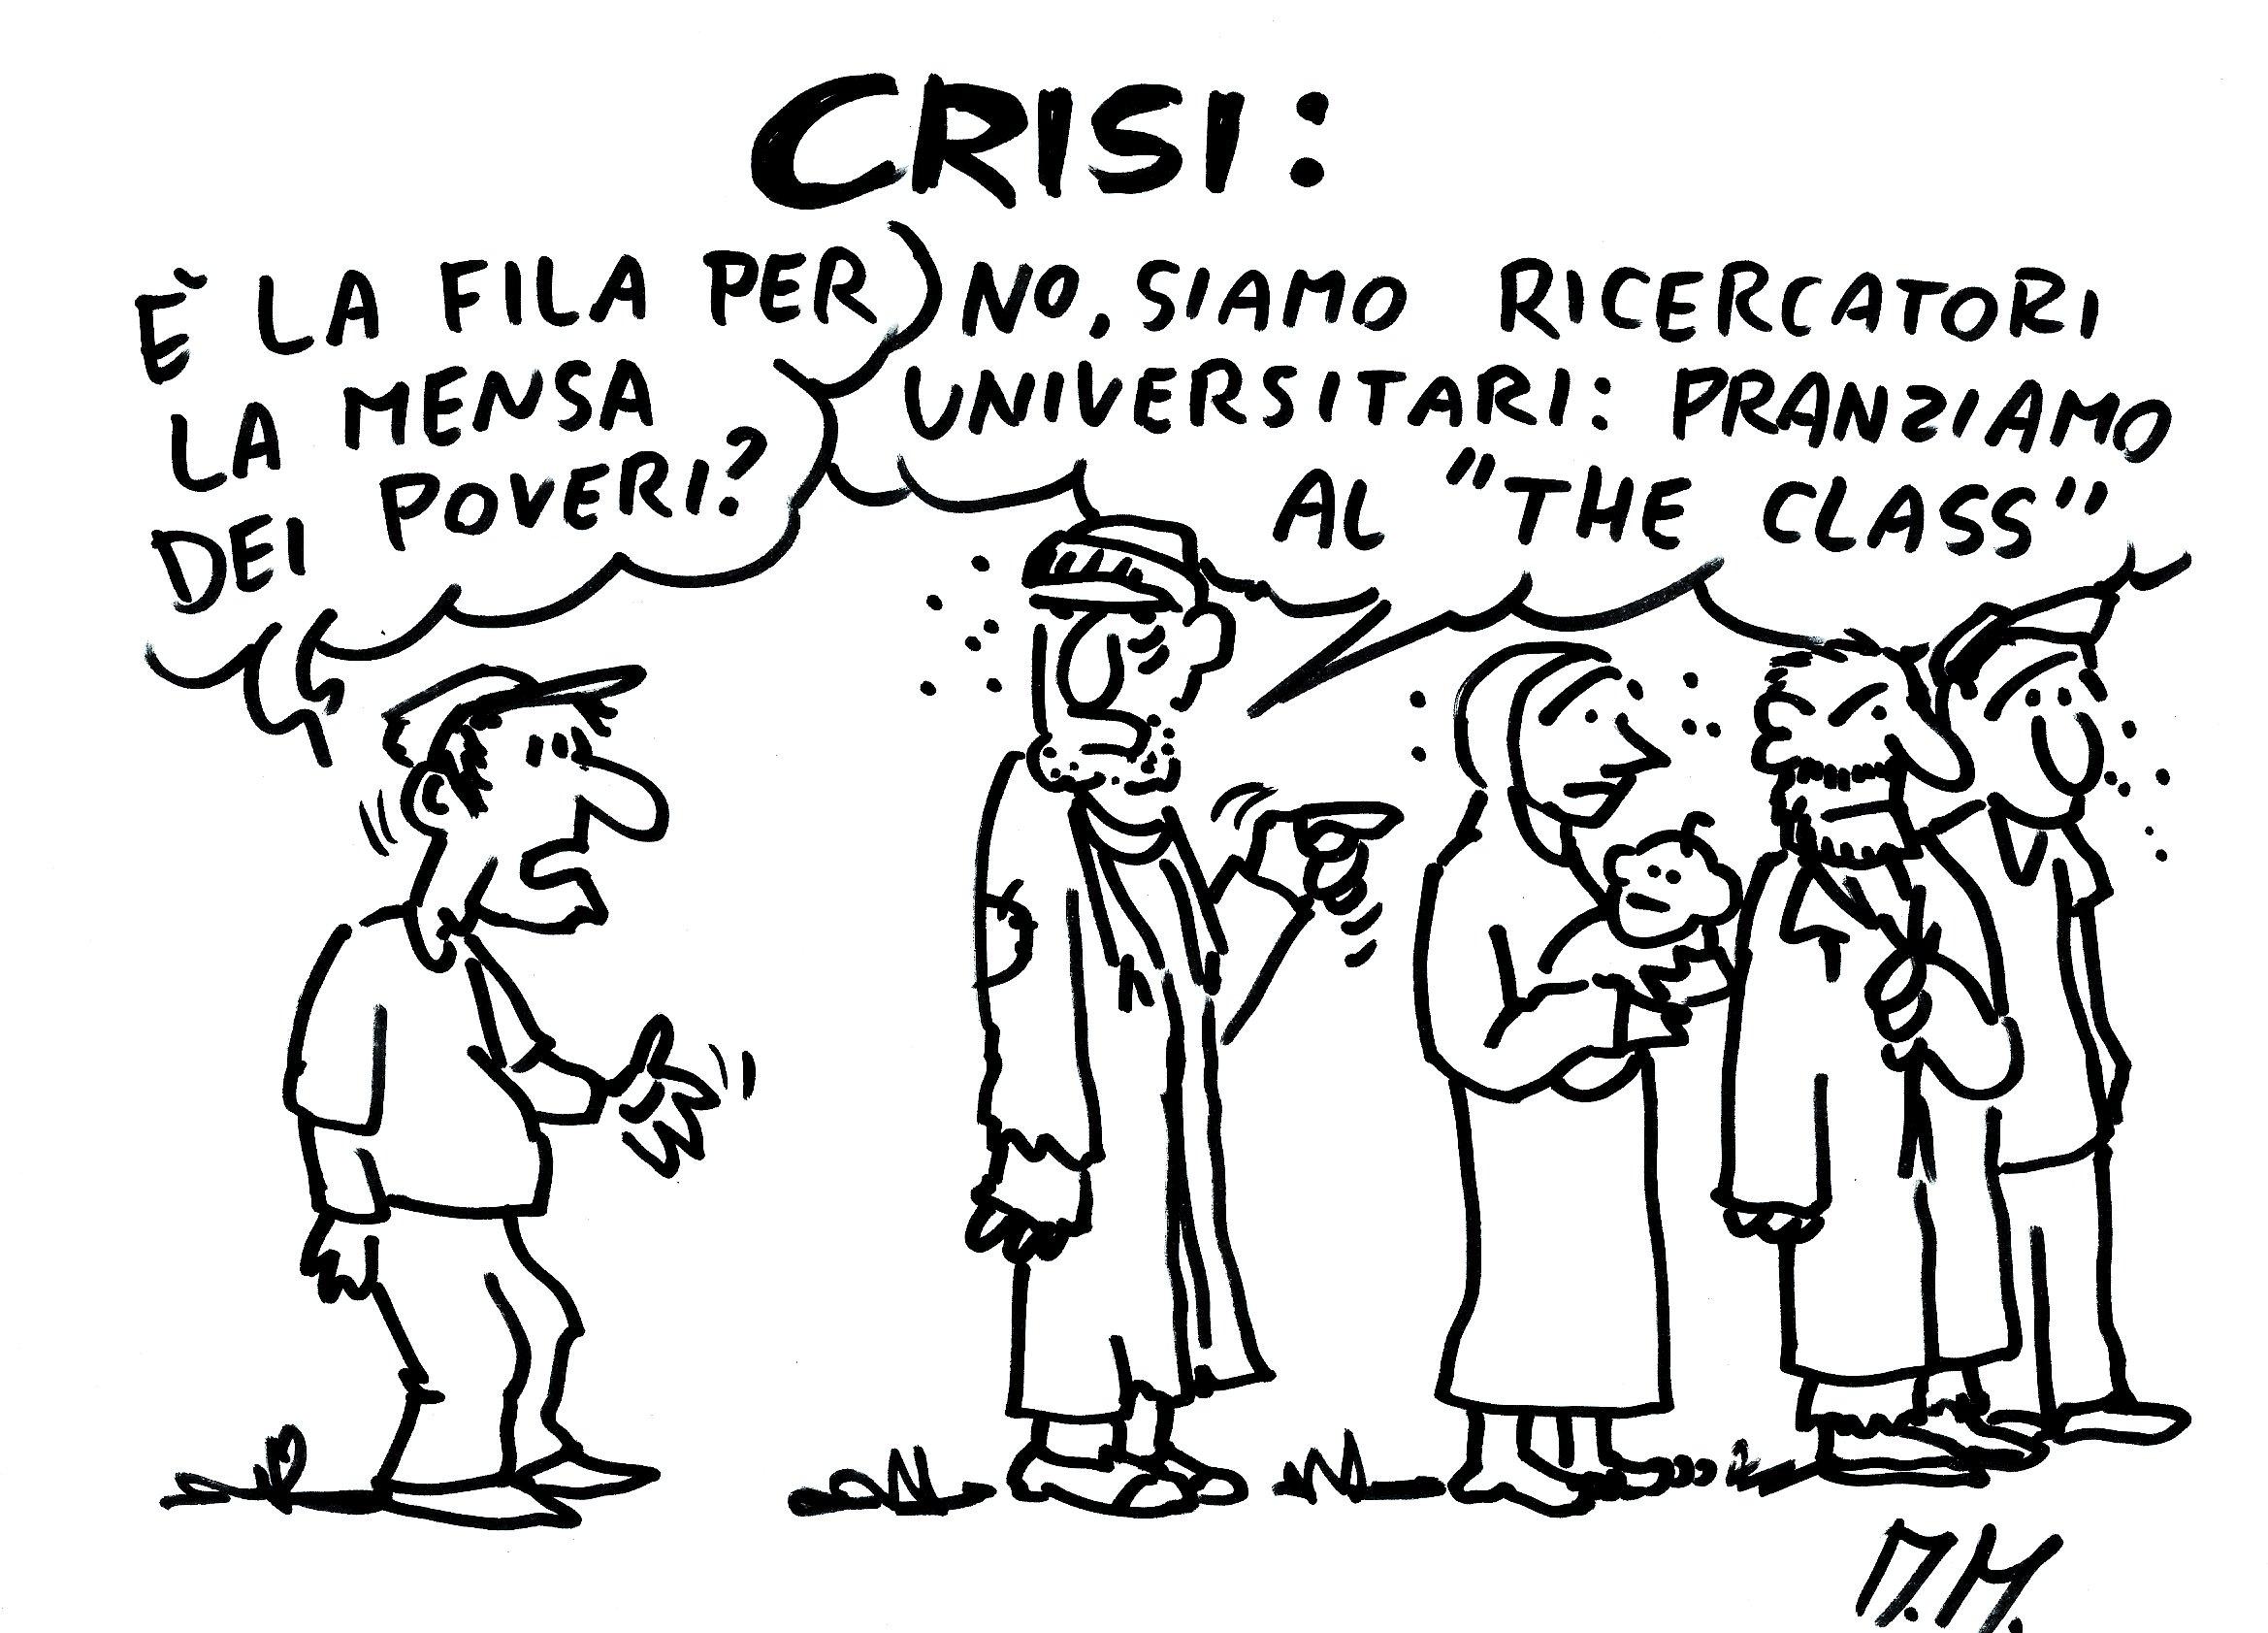 vign-crisi-theclass